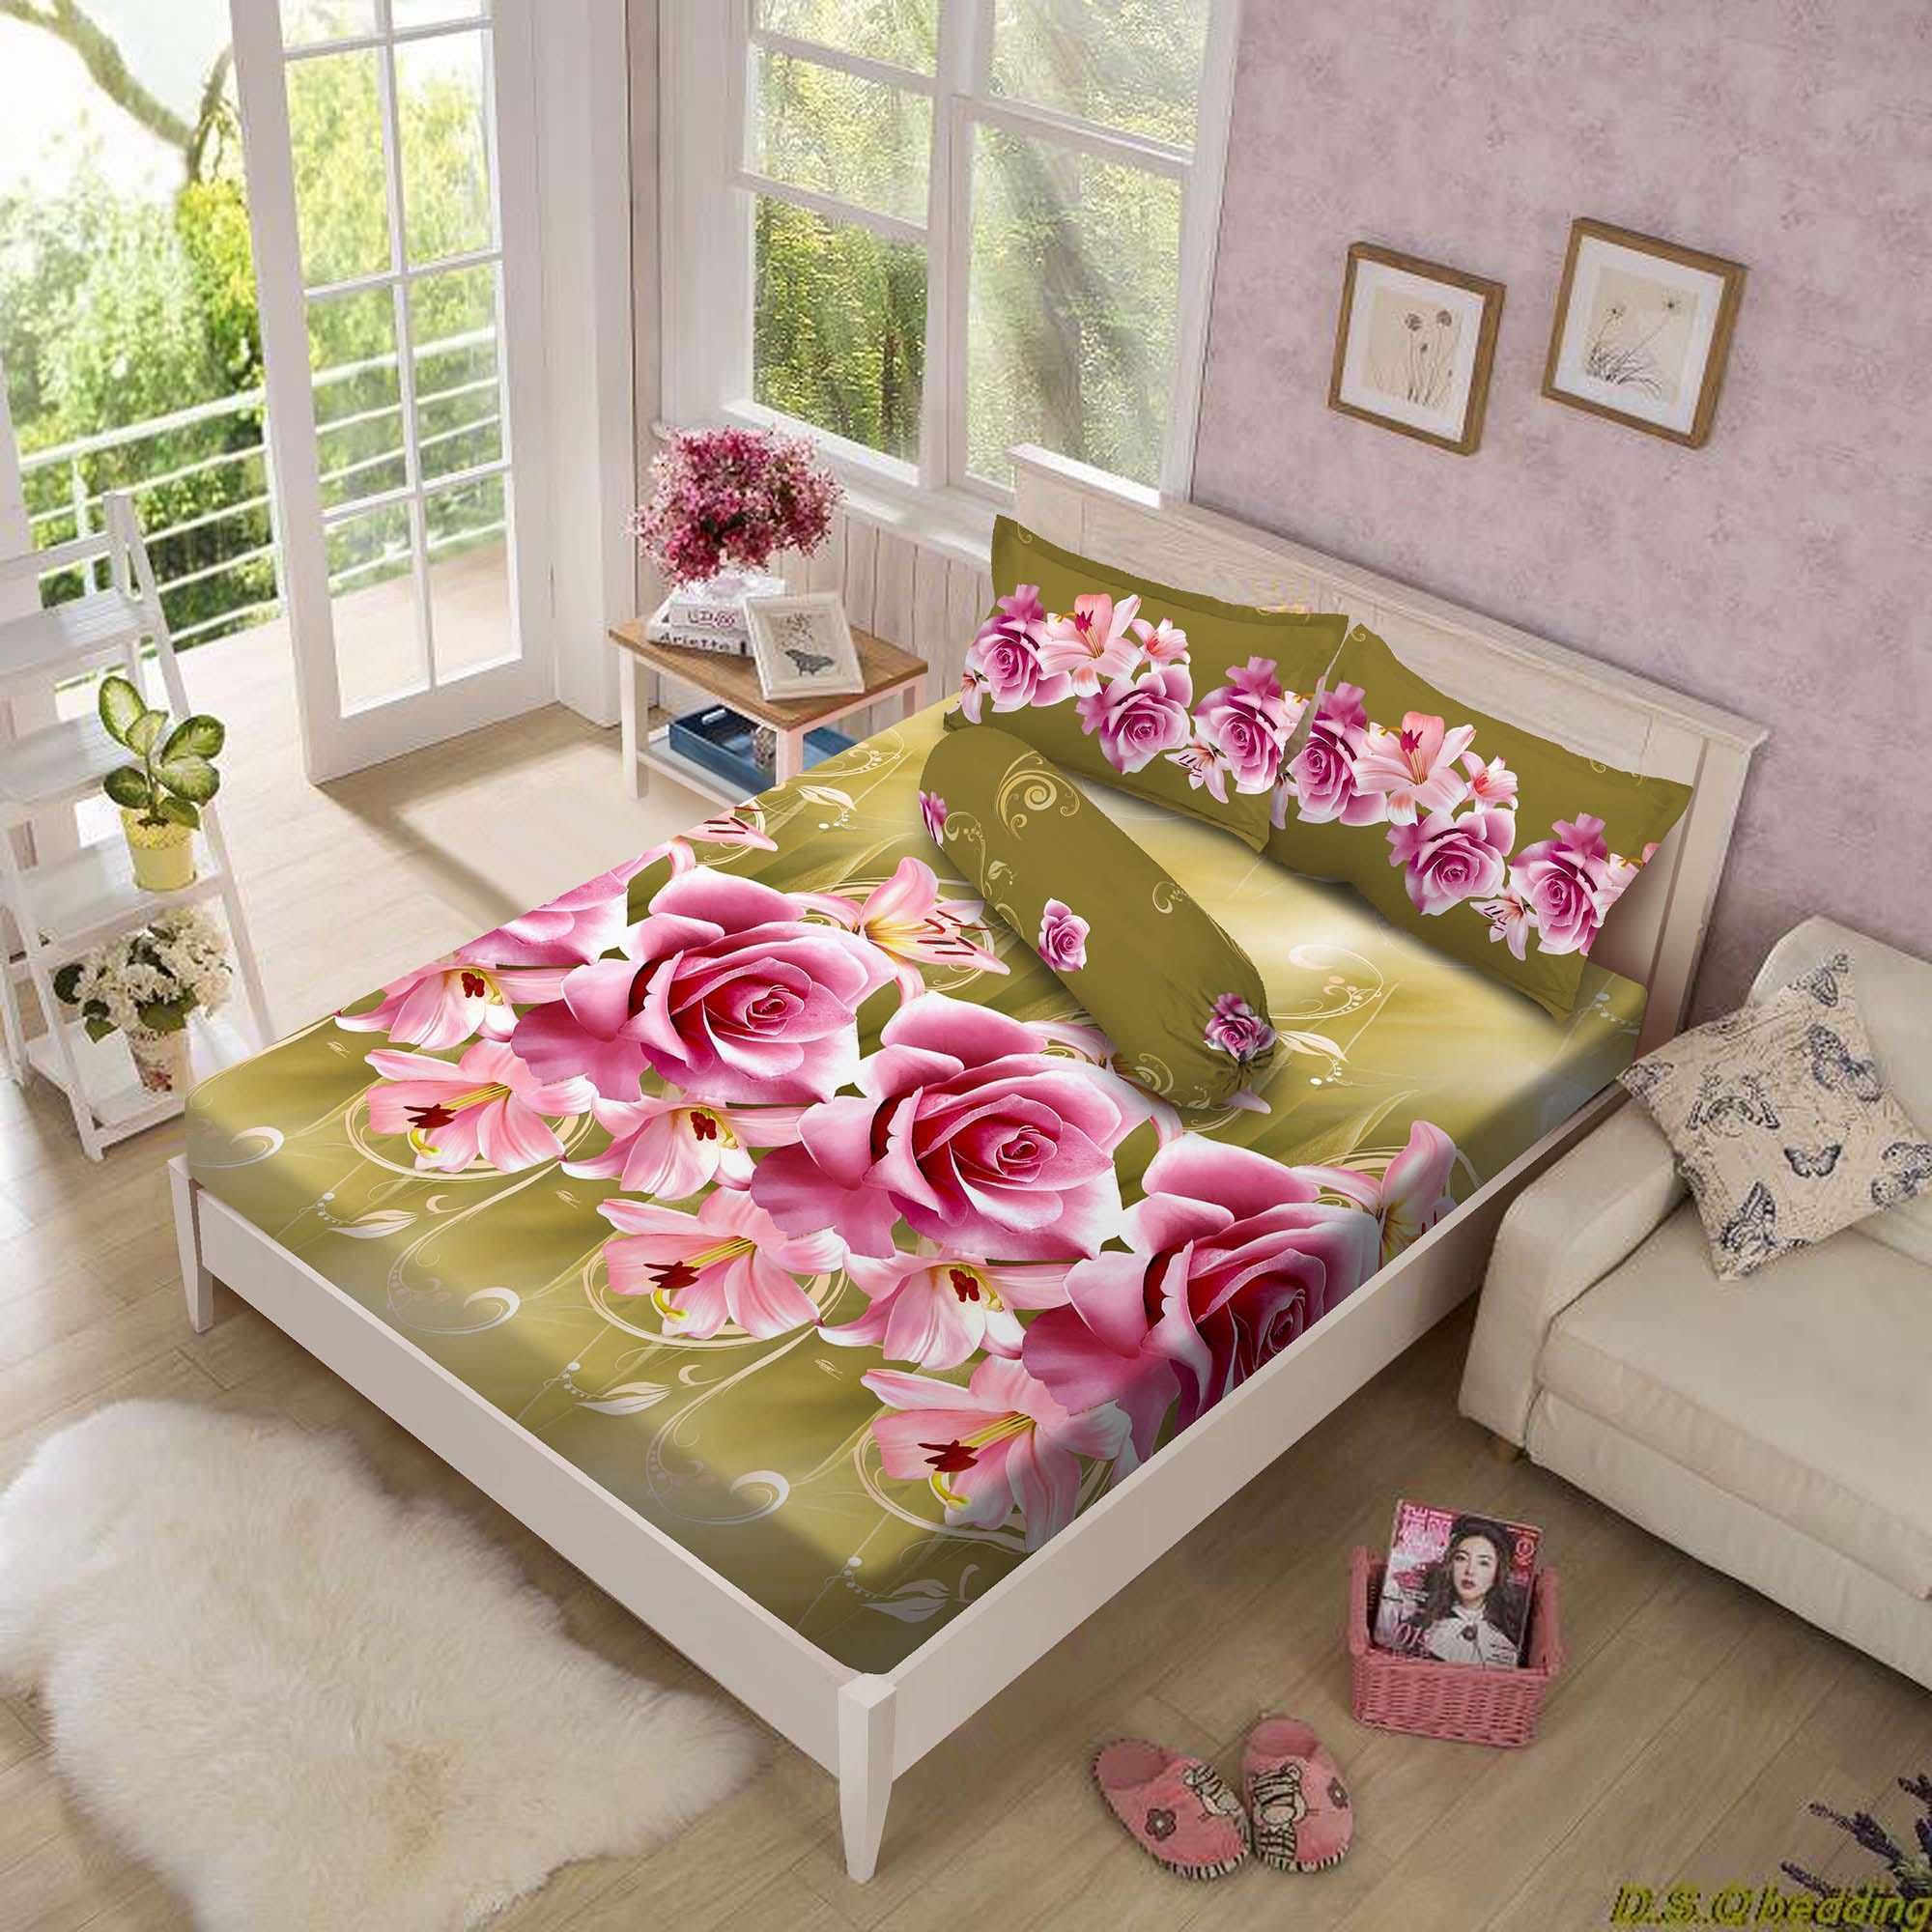 Beli Sekarang Kintakun Luxury Ramona Sprei 180x200x30 Di Indonesia Babybee Fitted Bed Sheet Blue Polkadot 95x65 Cm 160 X 200 B2 Queen Calista